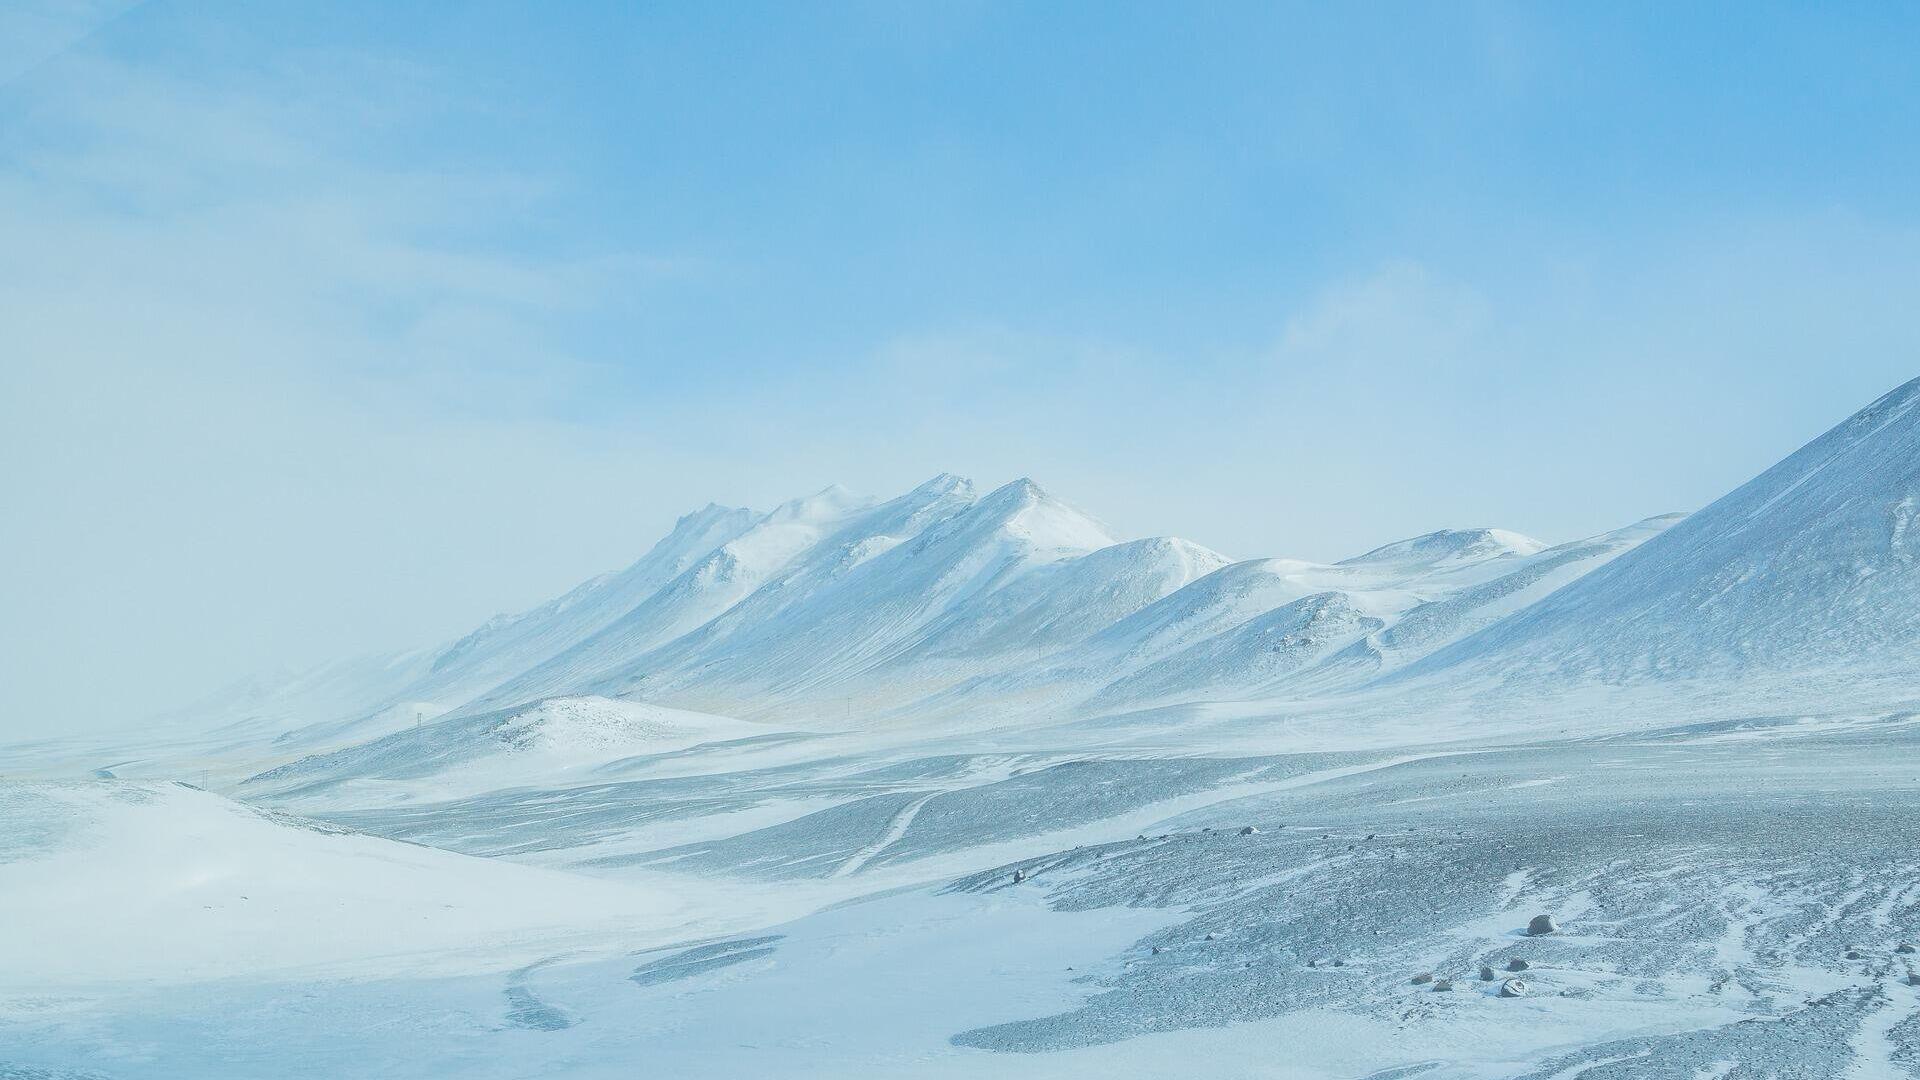 Планина под снегом - Sputnik Србија, 1920, 20.09.2021